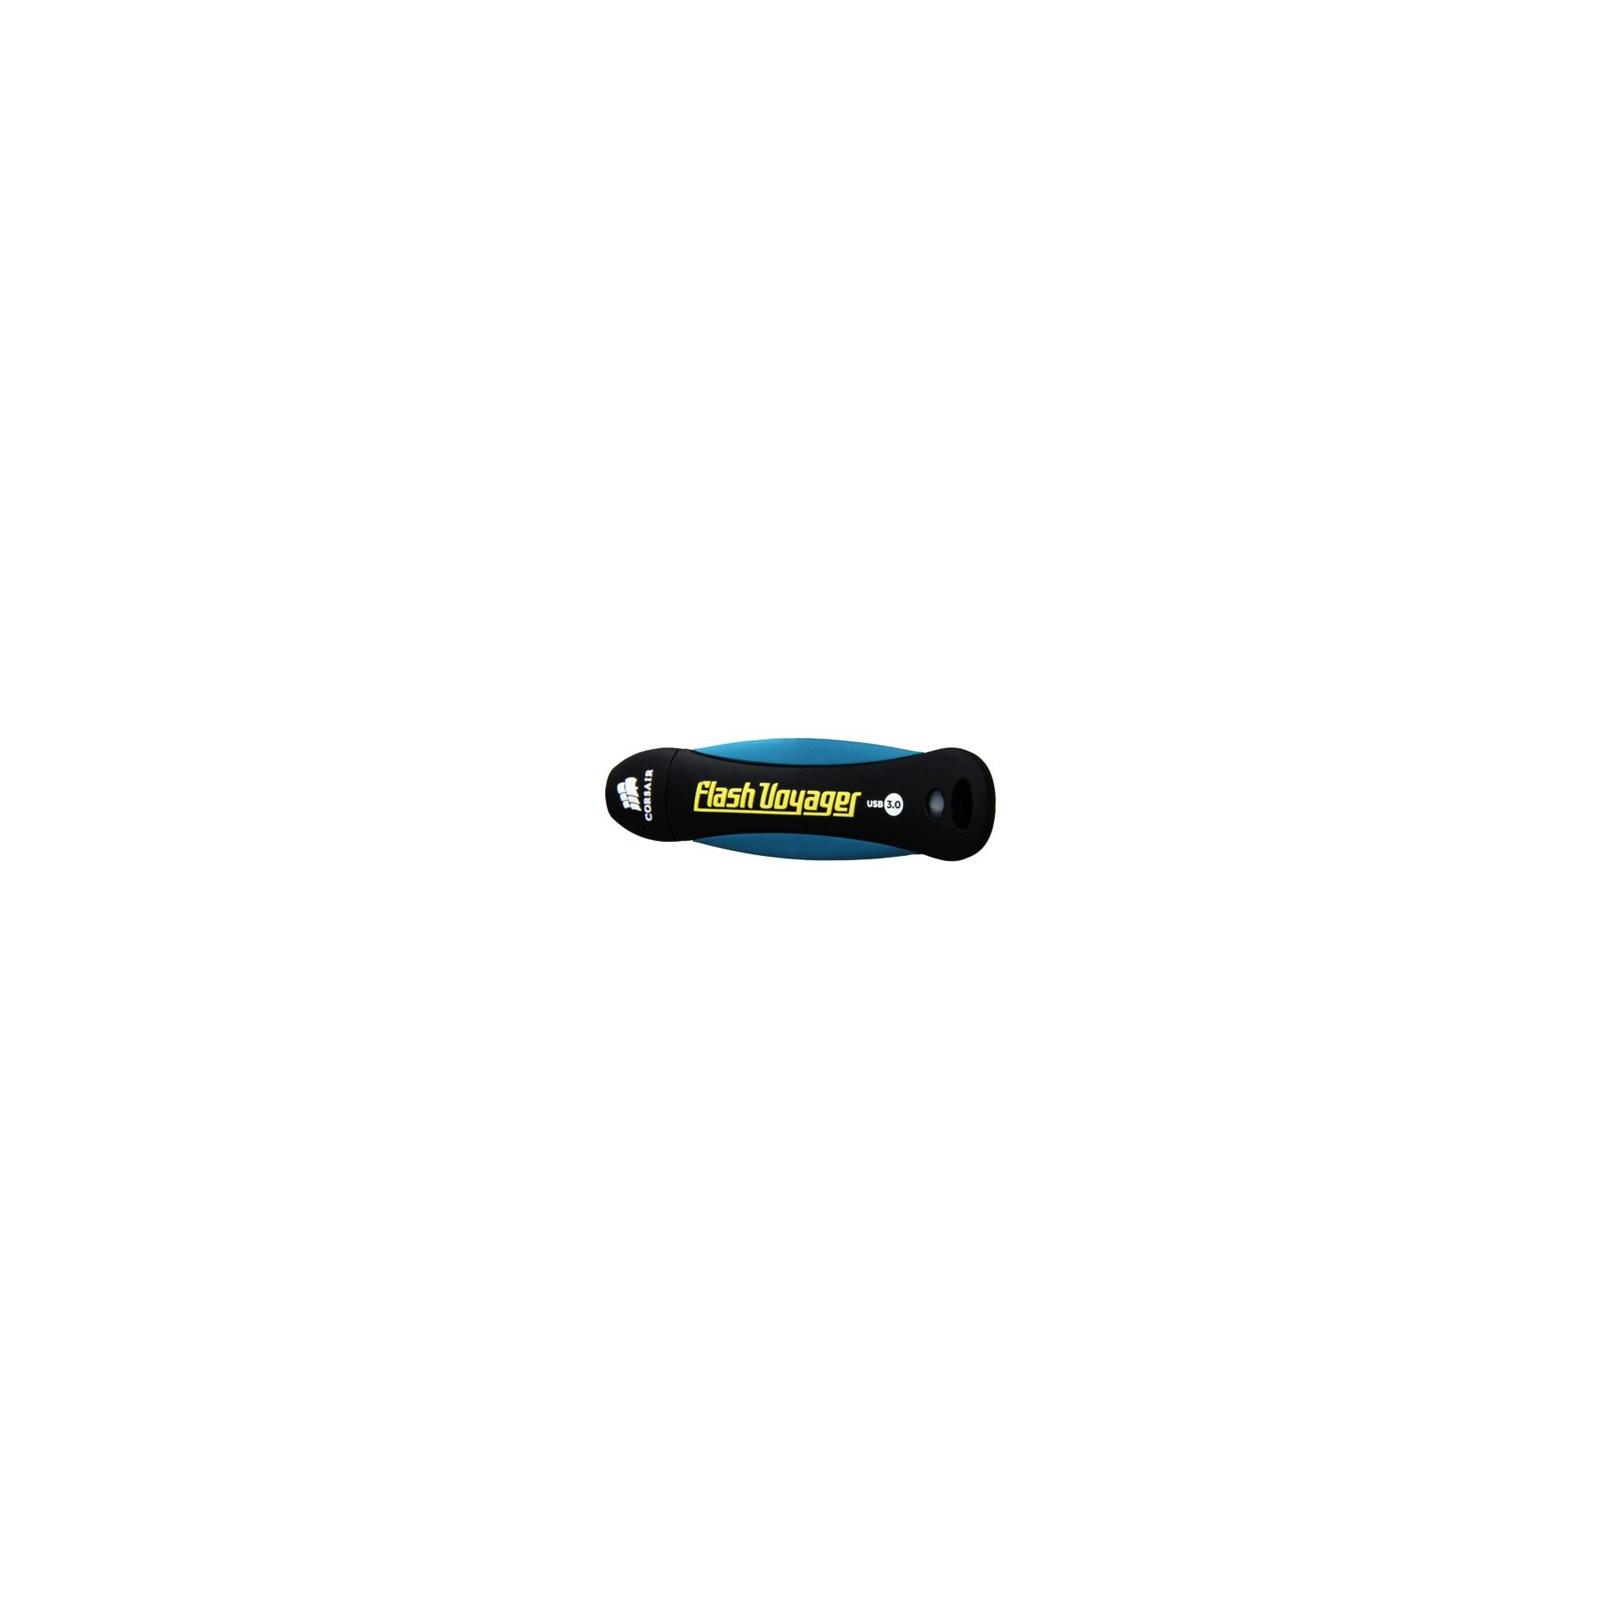 USB флеш накопитель 32Gb Flash Voyager S USB3.0 CORSAIR (CMFVY3S-32GB)